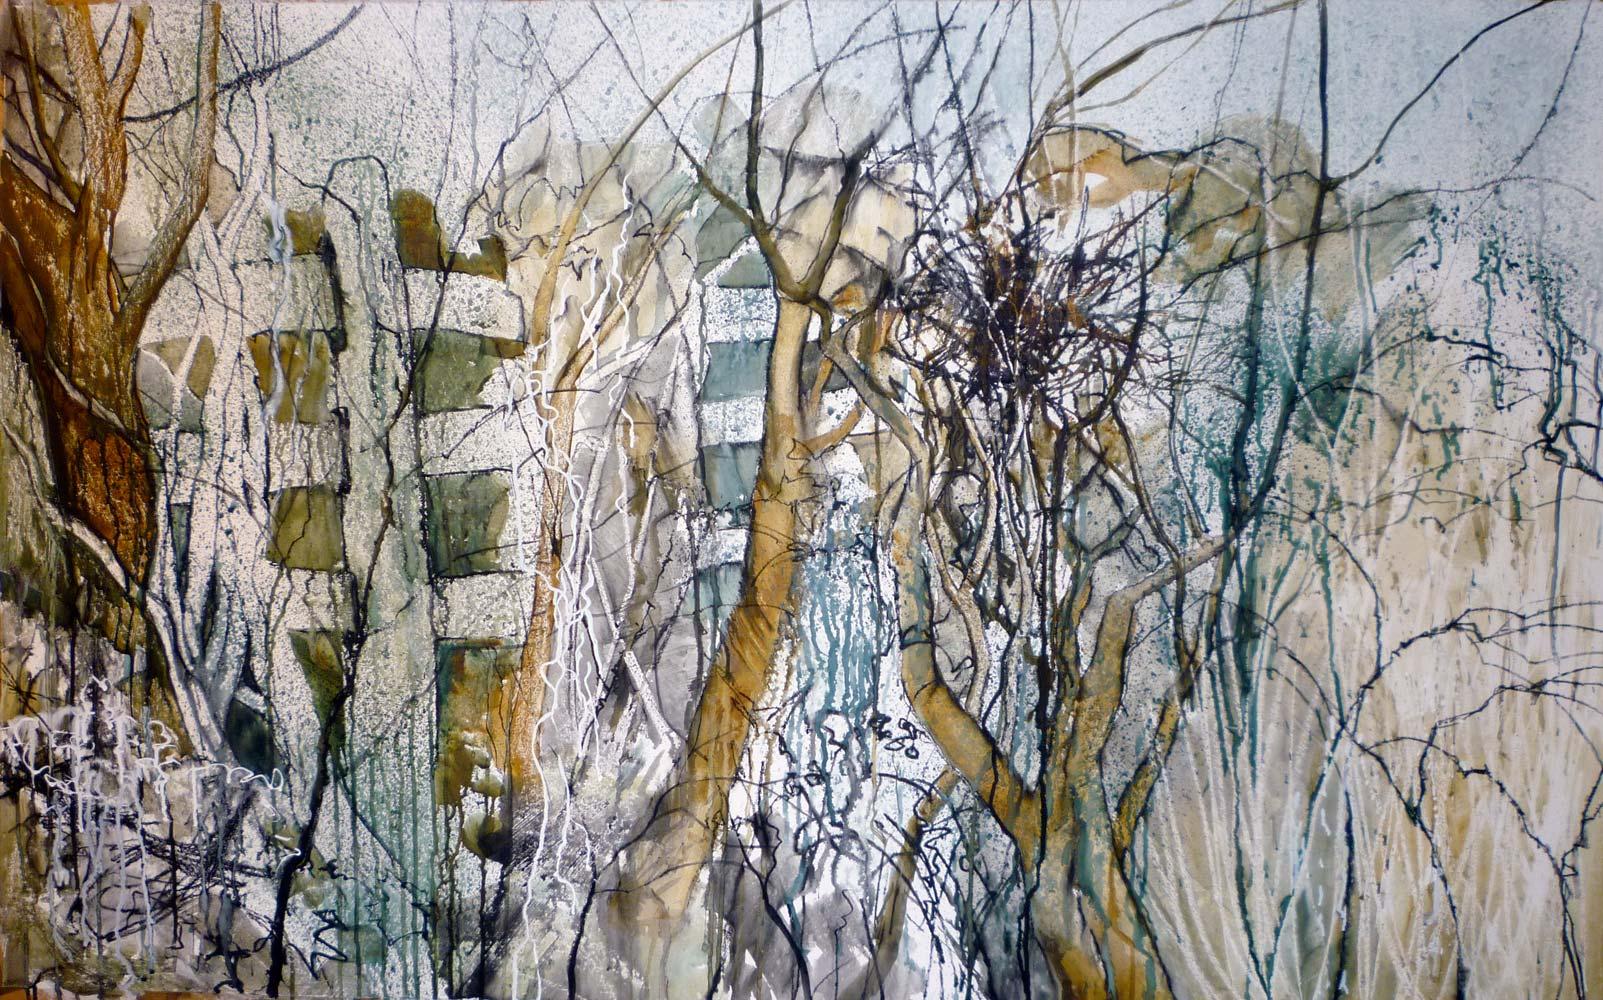 Winter hedgerow 3